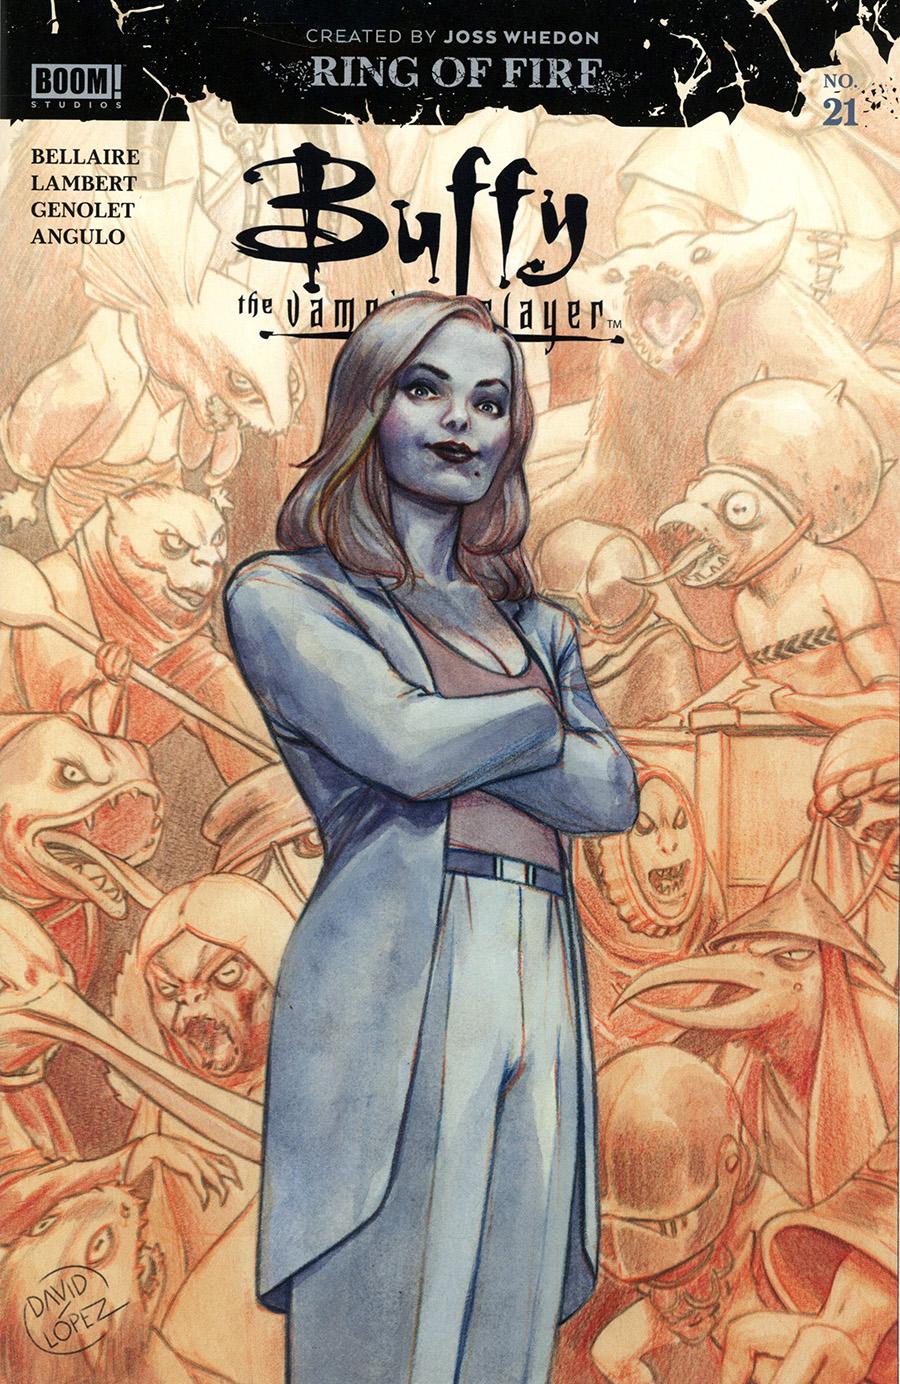 Buffy The Vampire Slayer Vol 2 #21 Cover A Regular David Lopez Cover